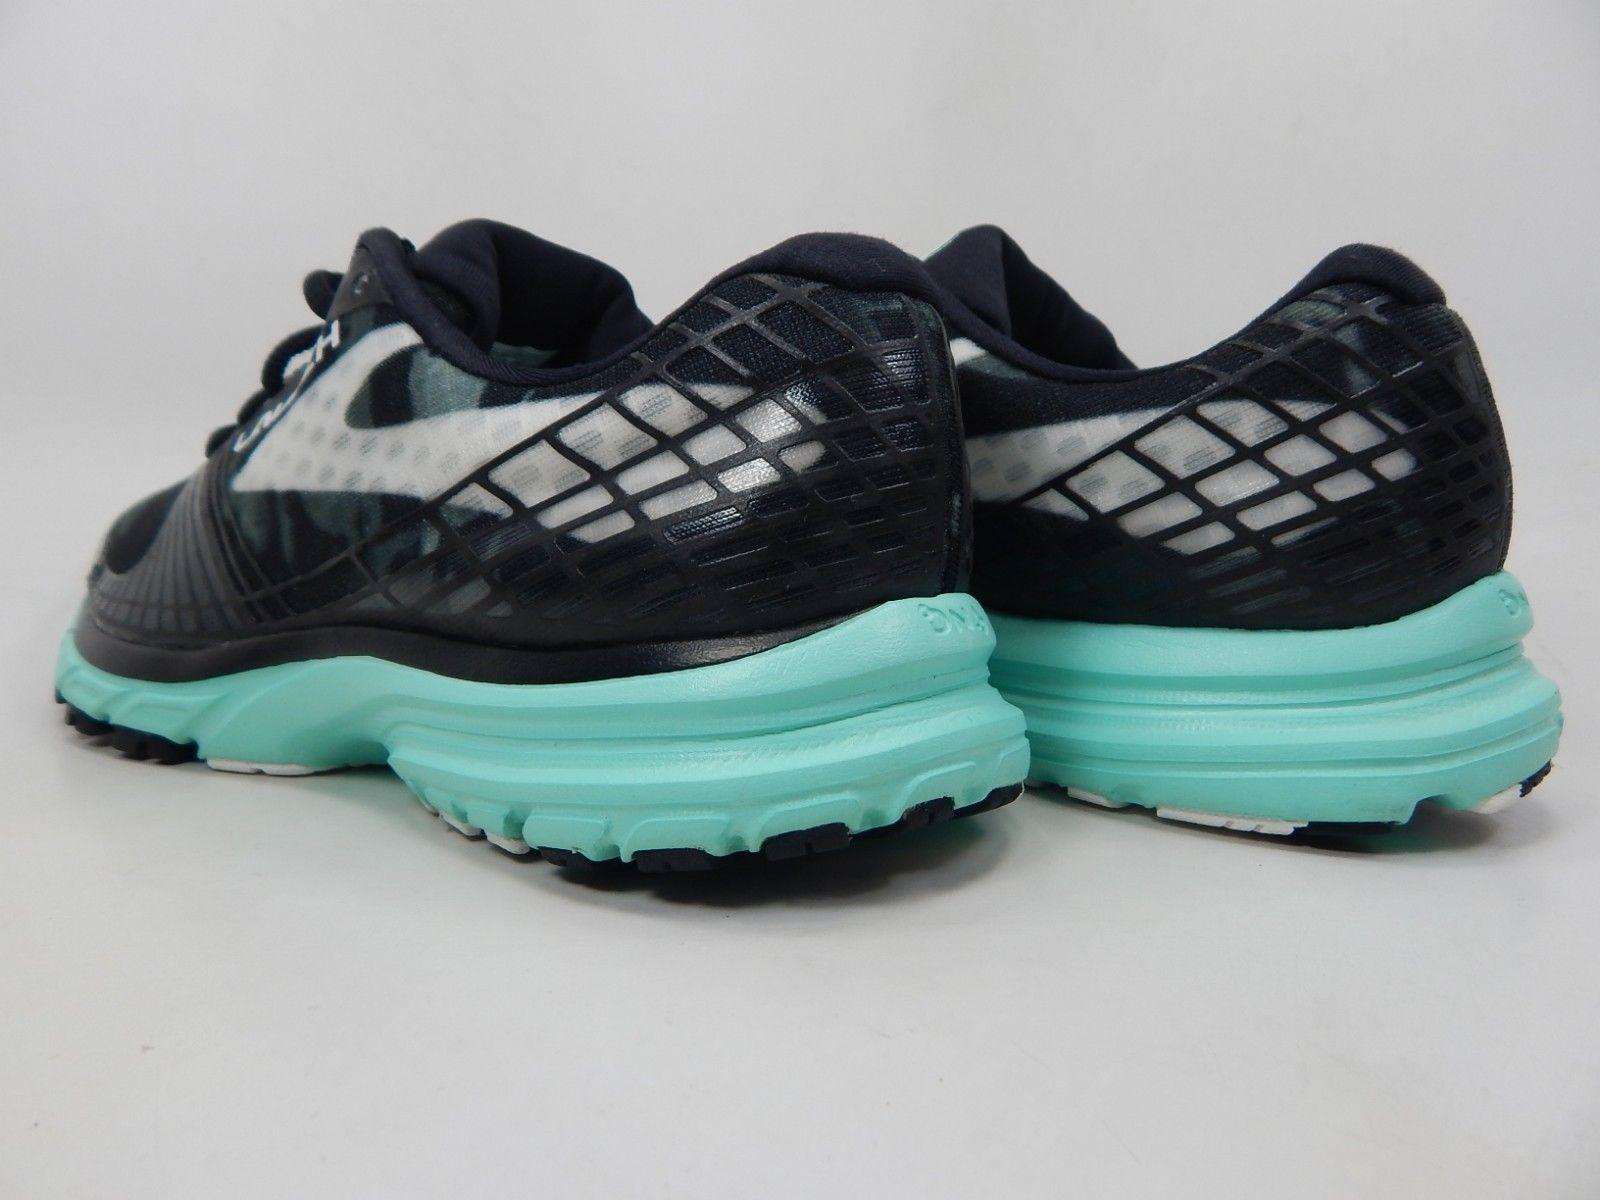 Brooks Launch 3 Size 6.5 M (B) EU 37.5 Women's Running Shoes Black 1202061B071 image 4